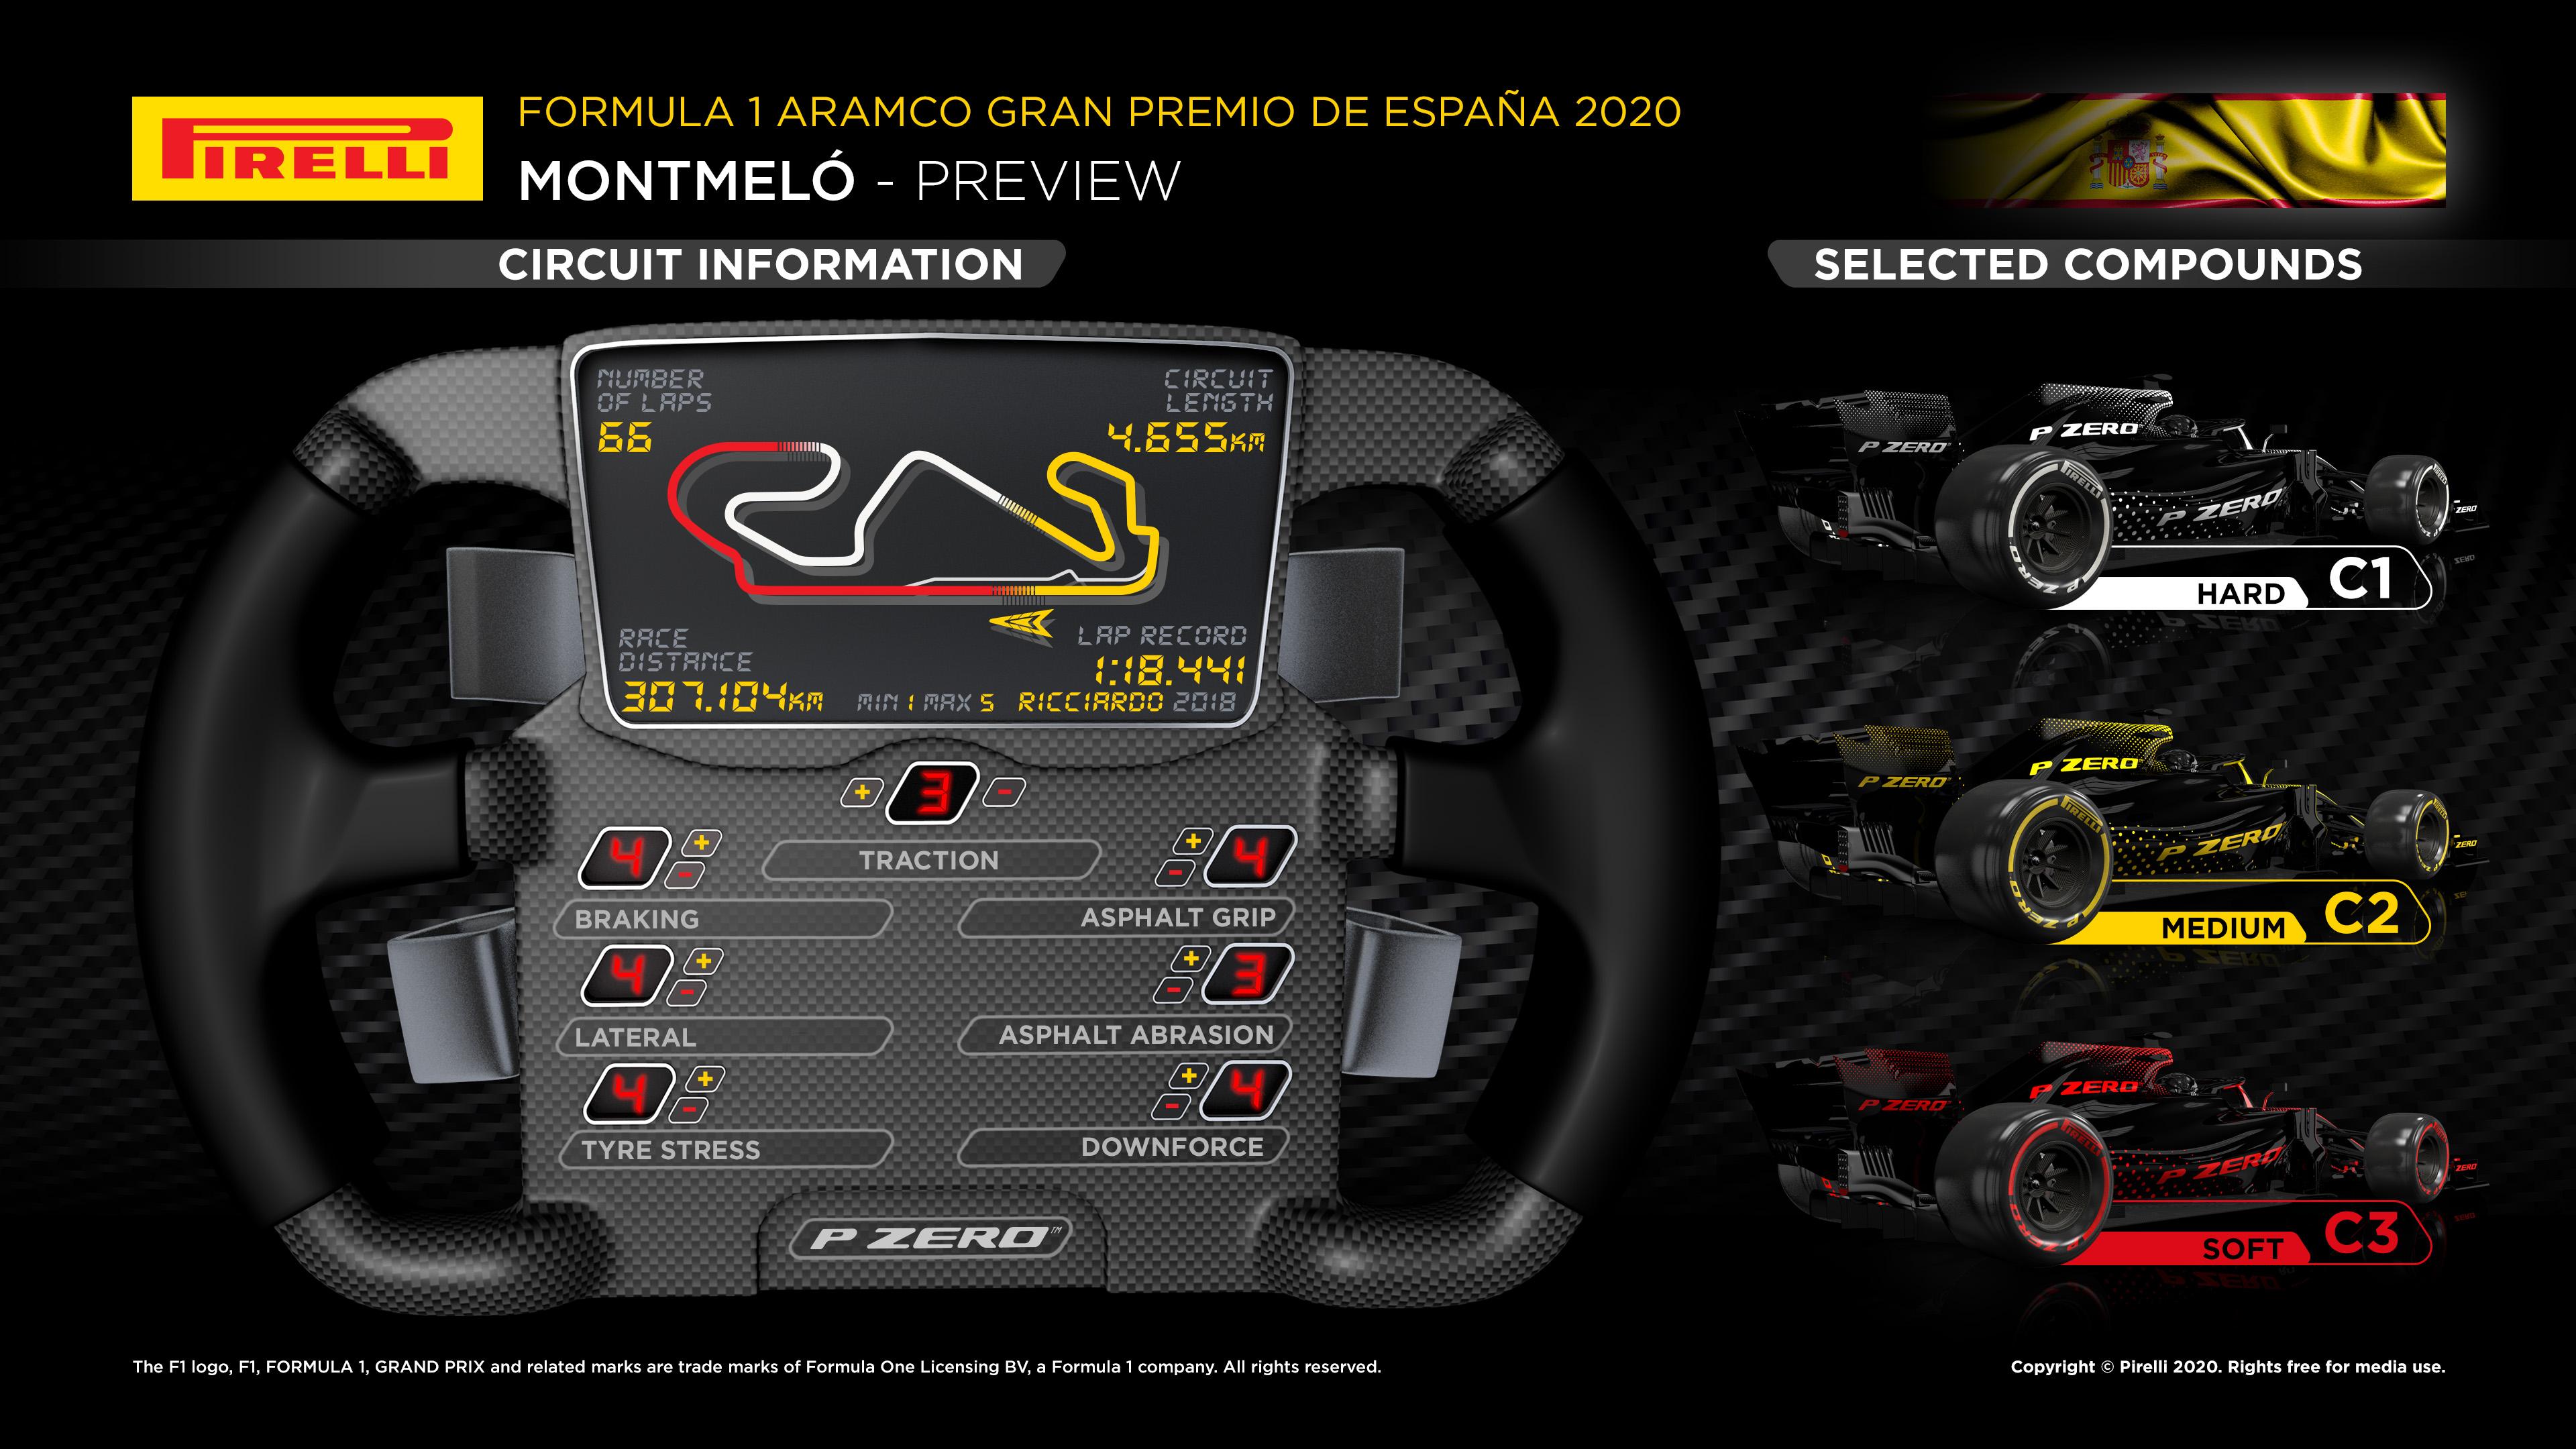 previo-pirelli-gp-espana-2020-soymotor.jpg